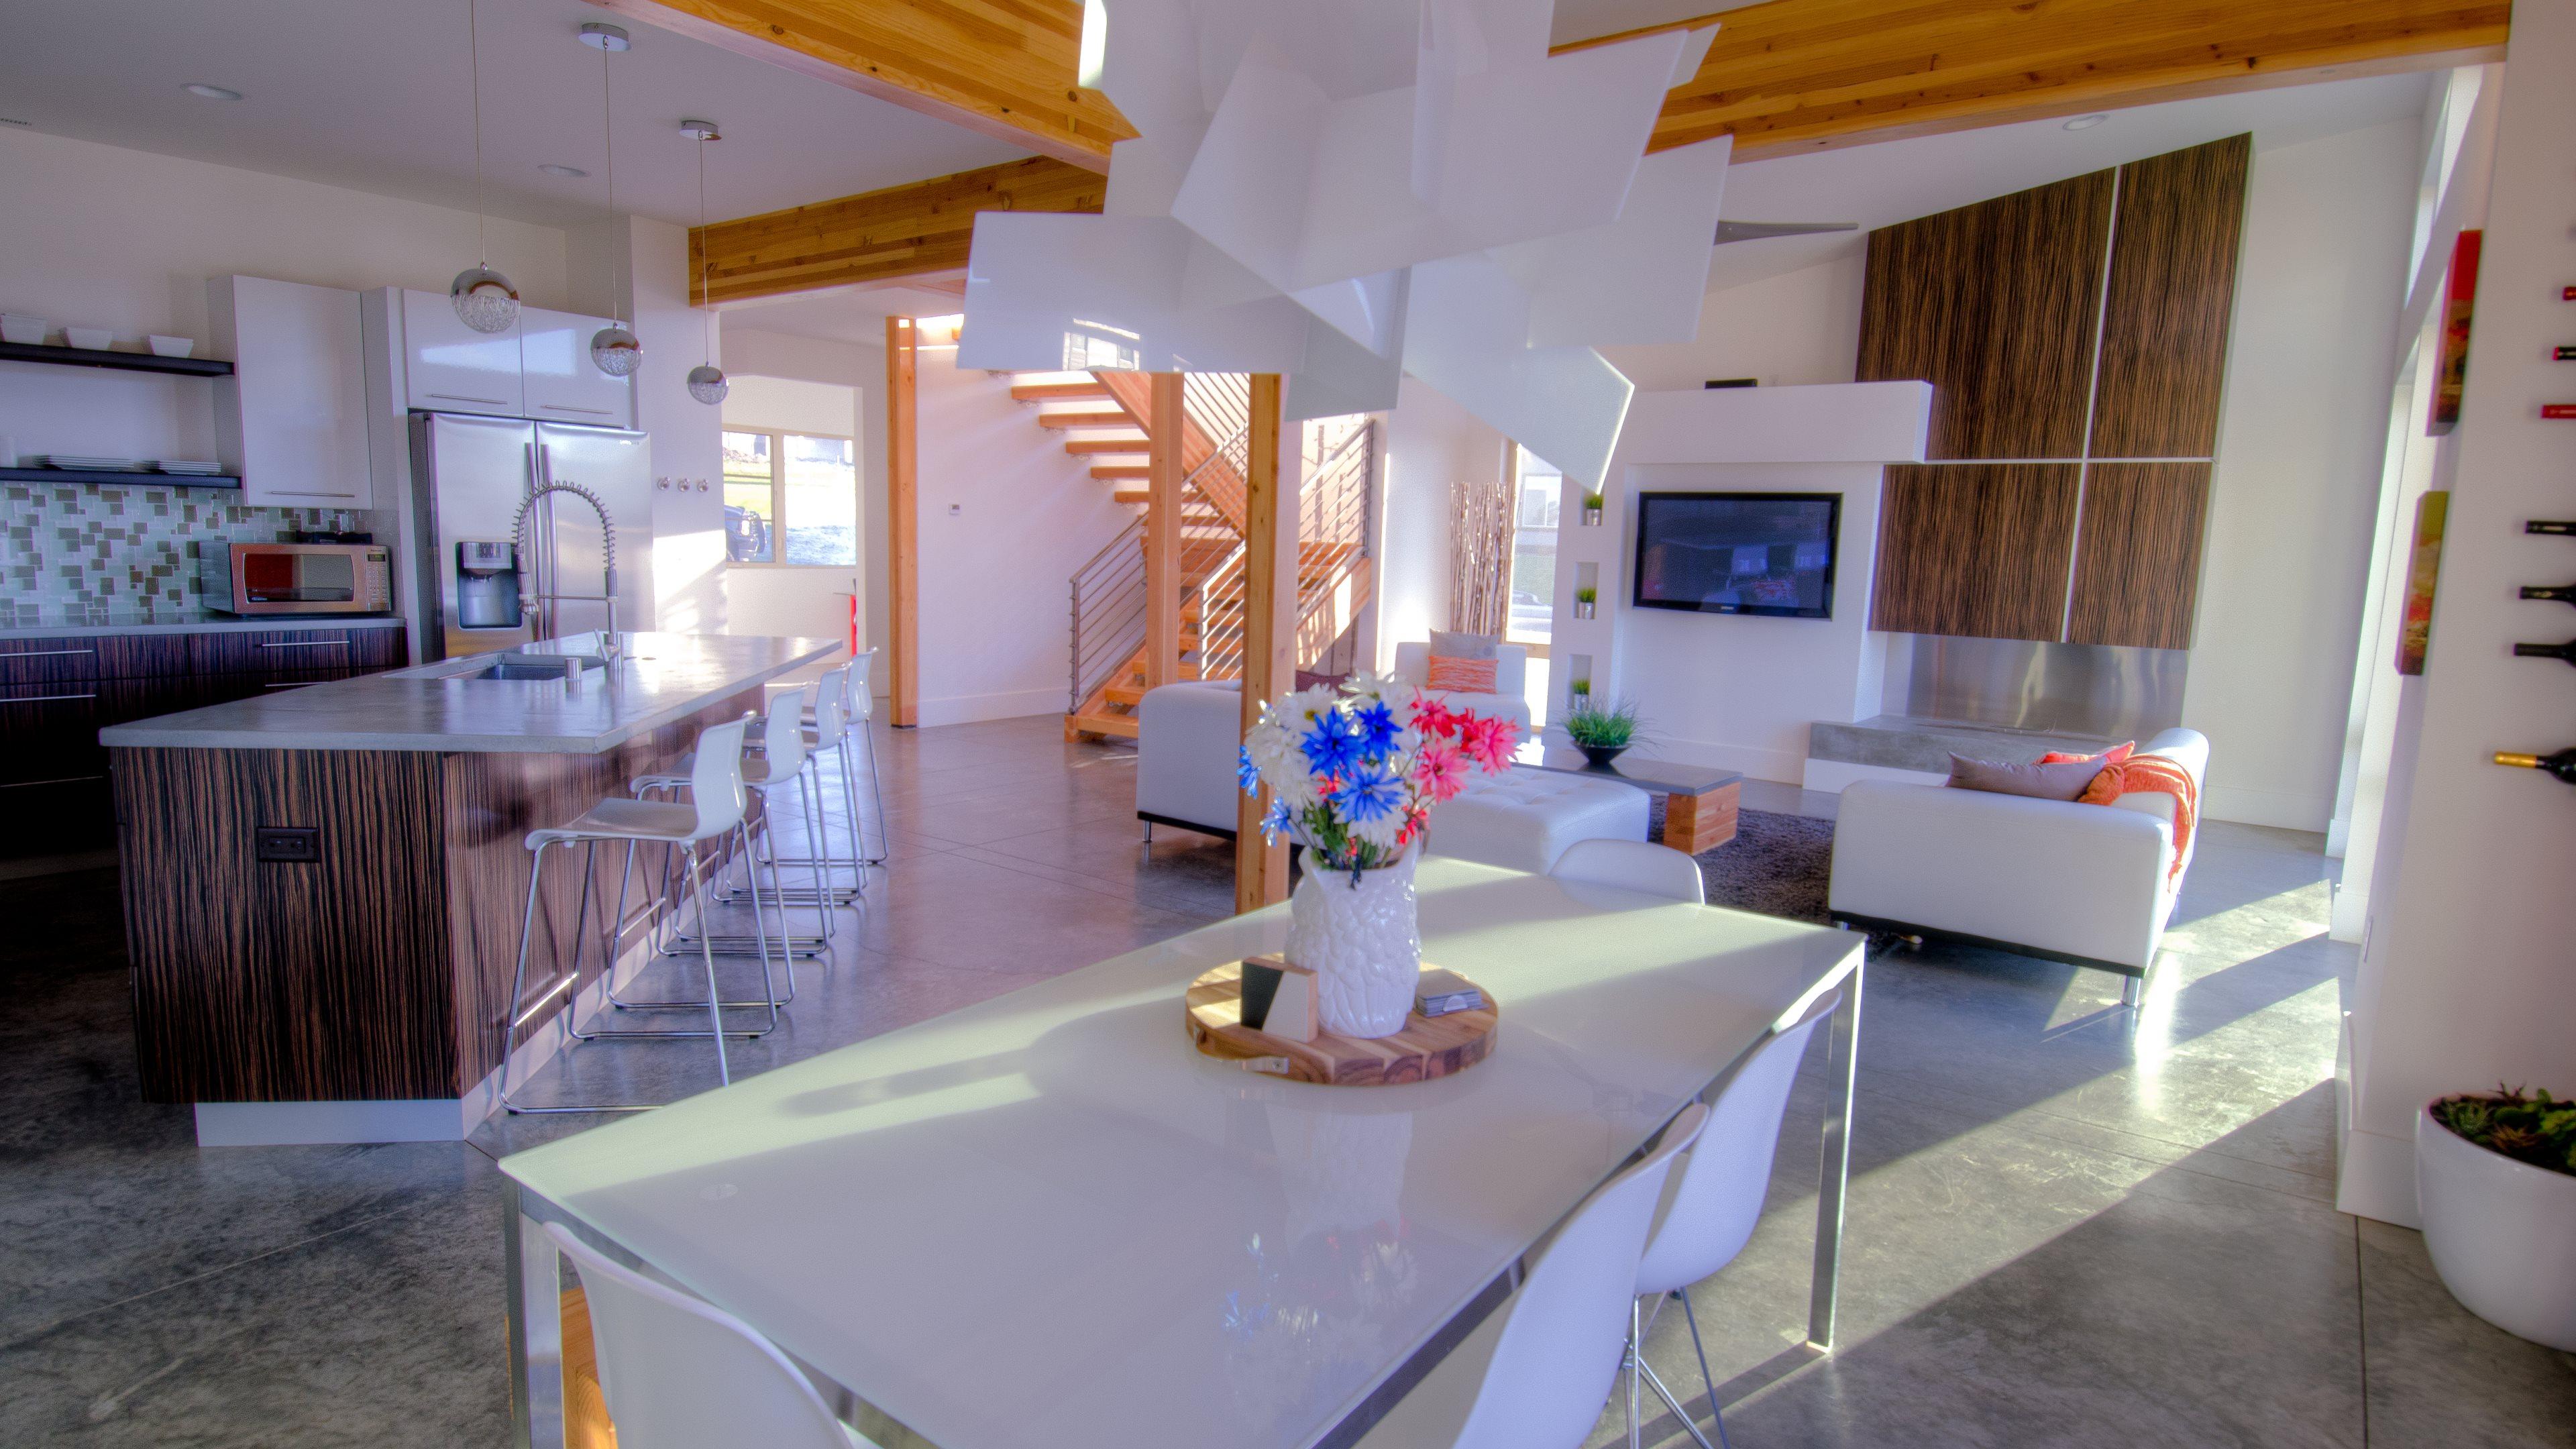 Home Wallpaper Kitchen | Wallpaper Home